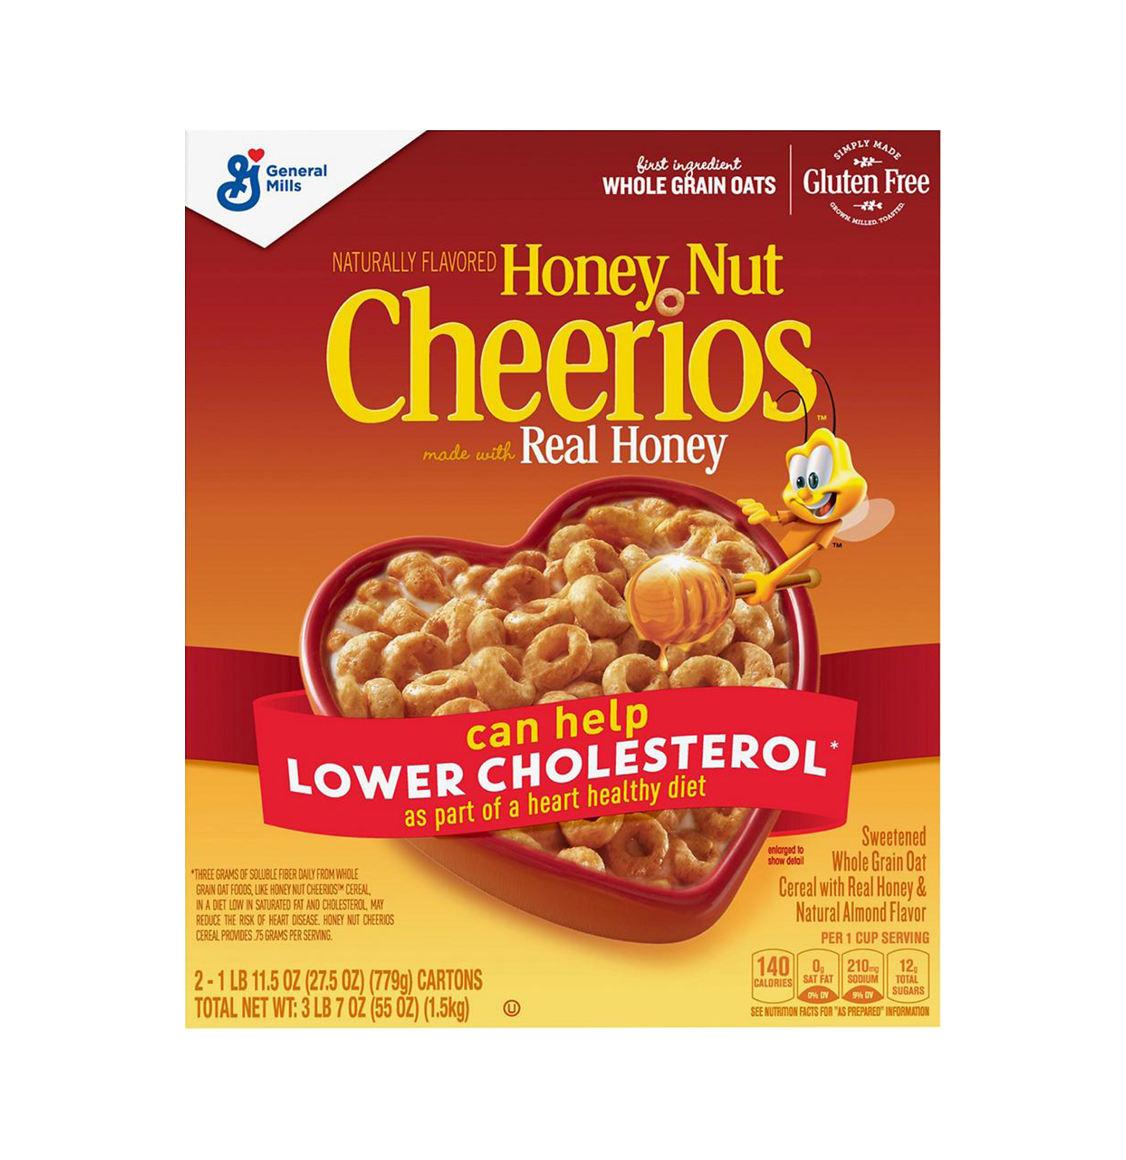 Honey Nut Cheerios General Mills 306g